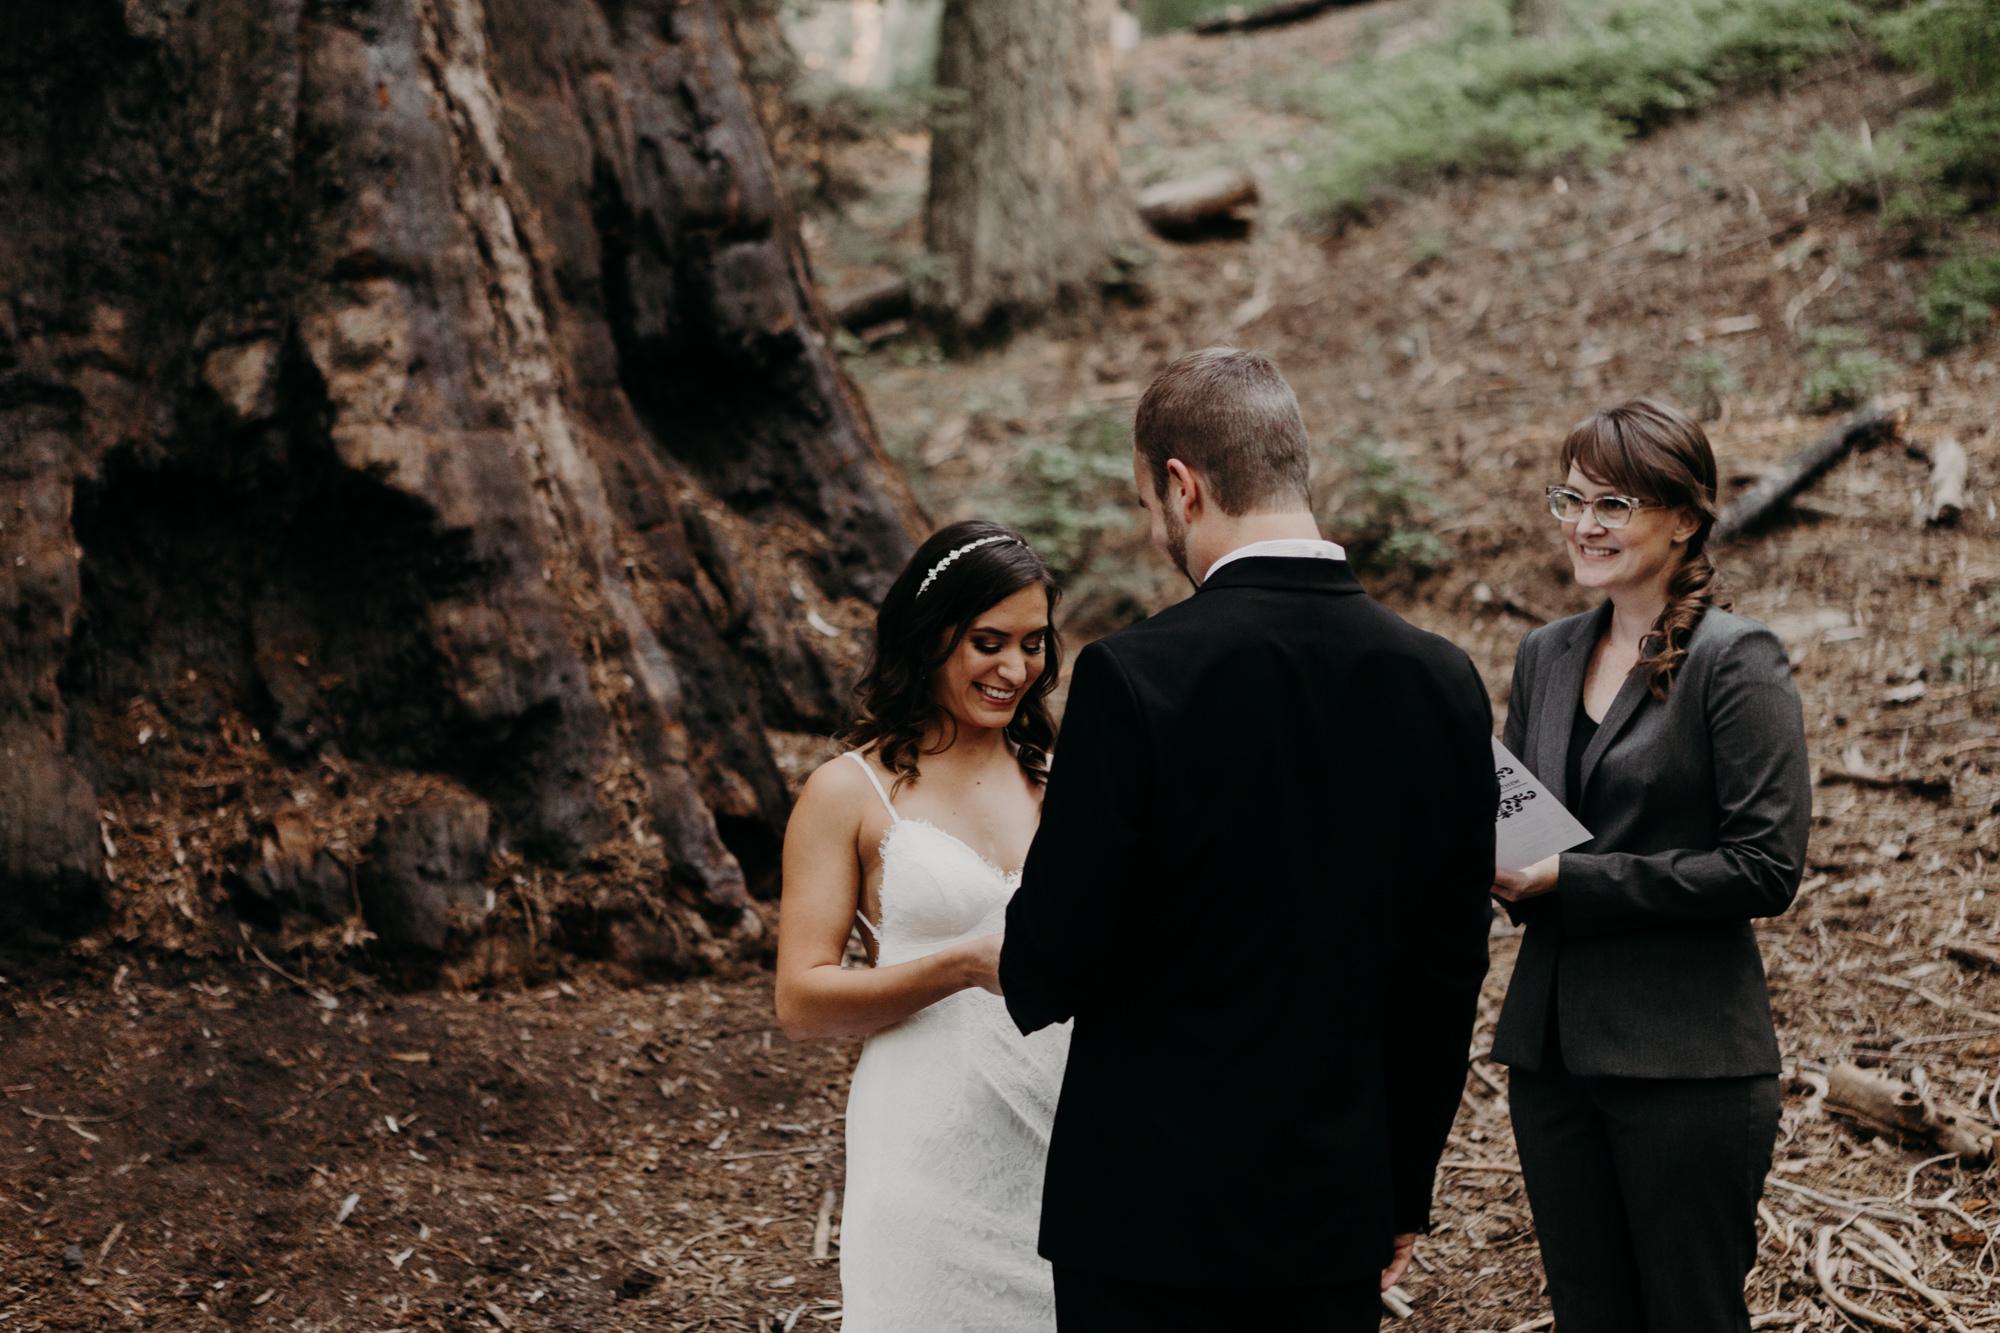 sequoia national park elopement-11.jpg